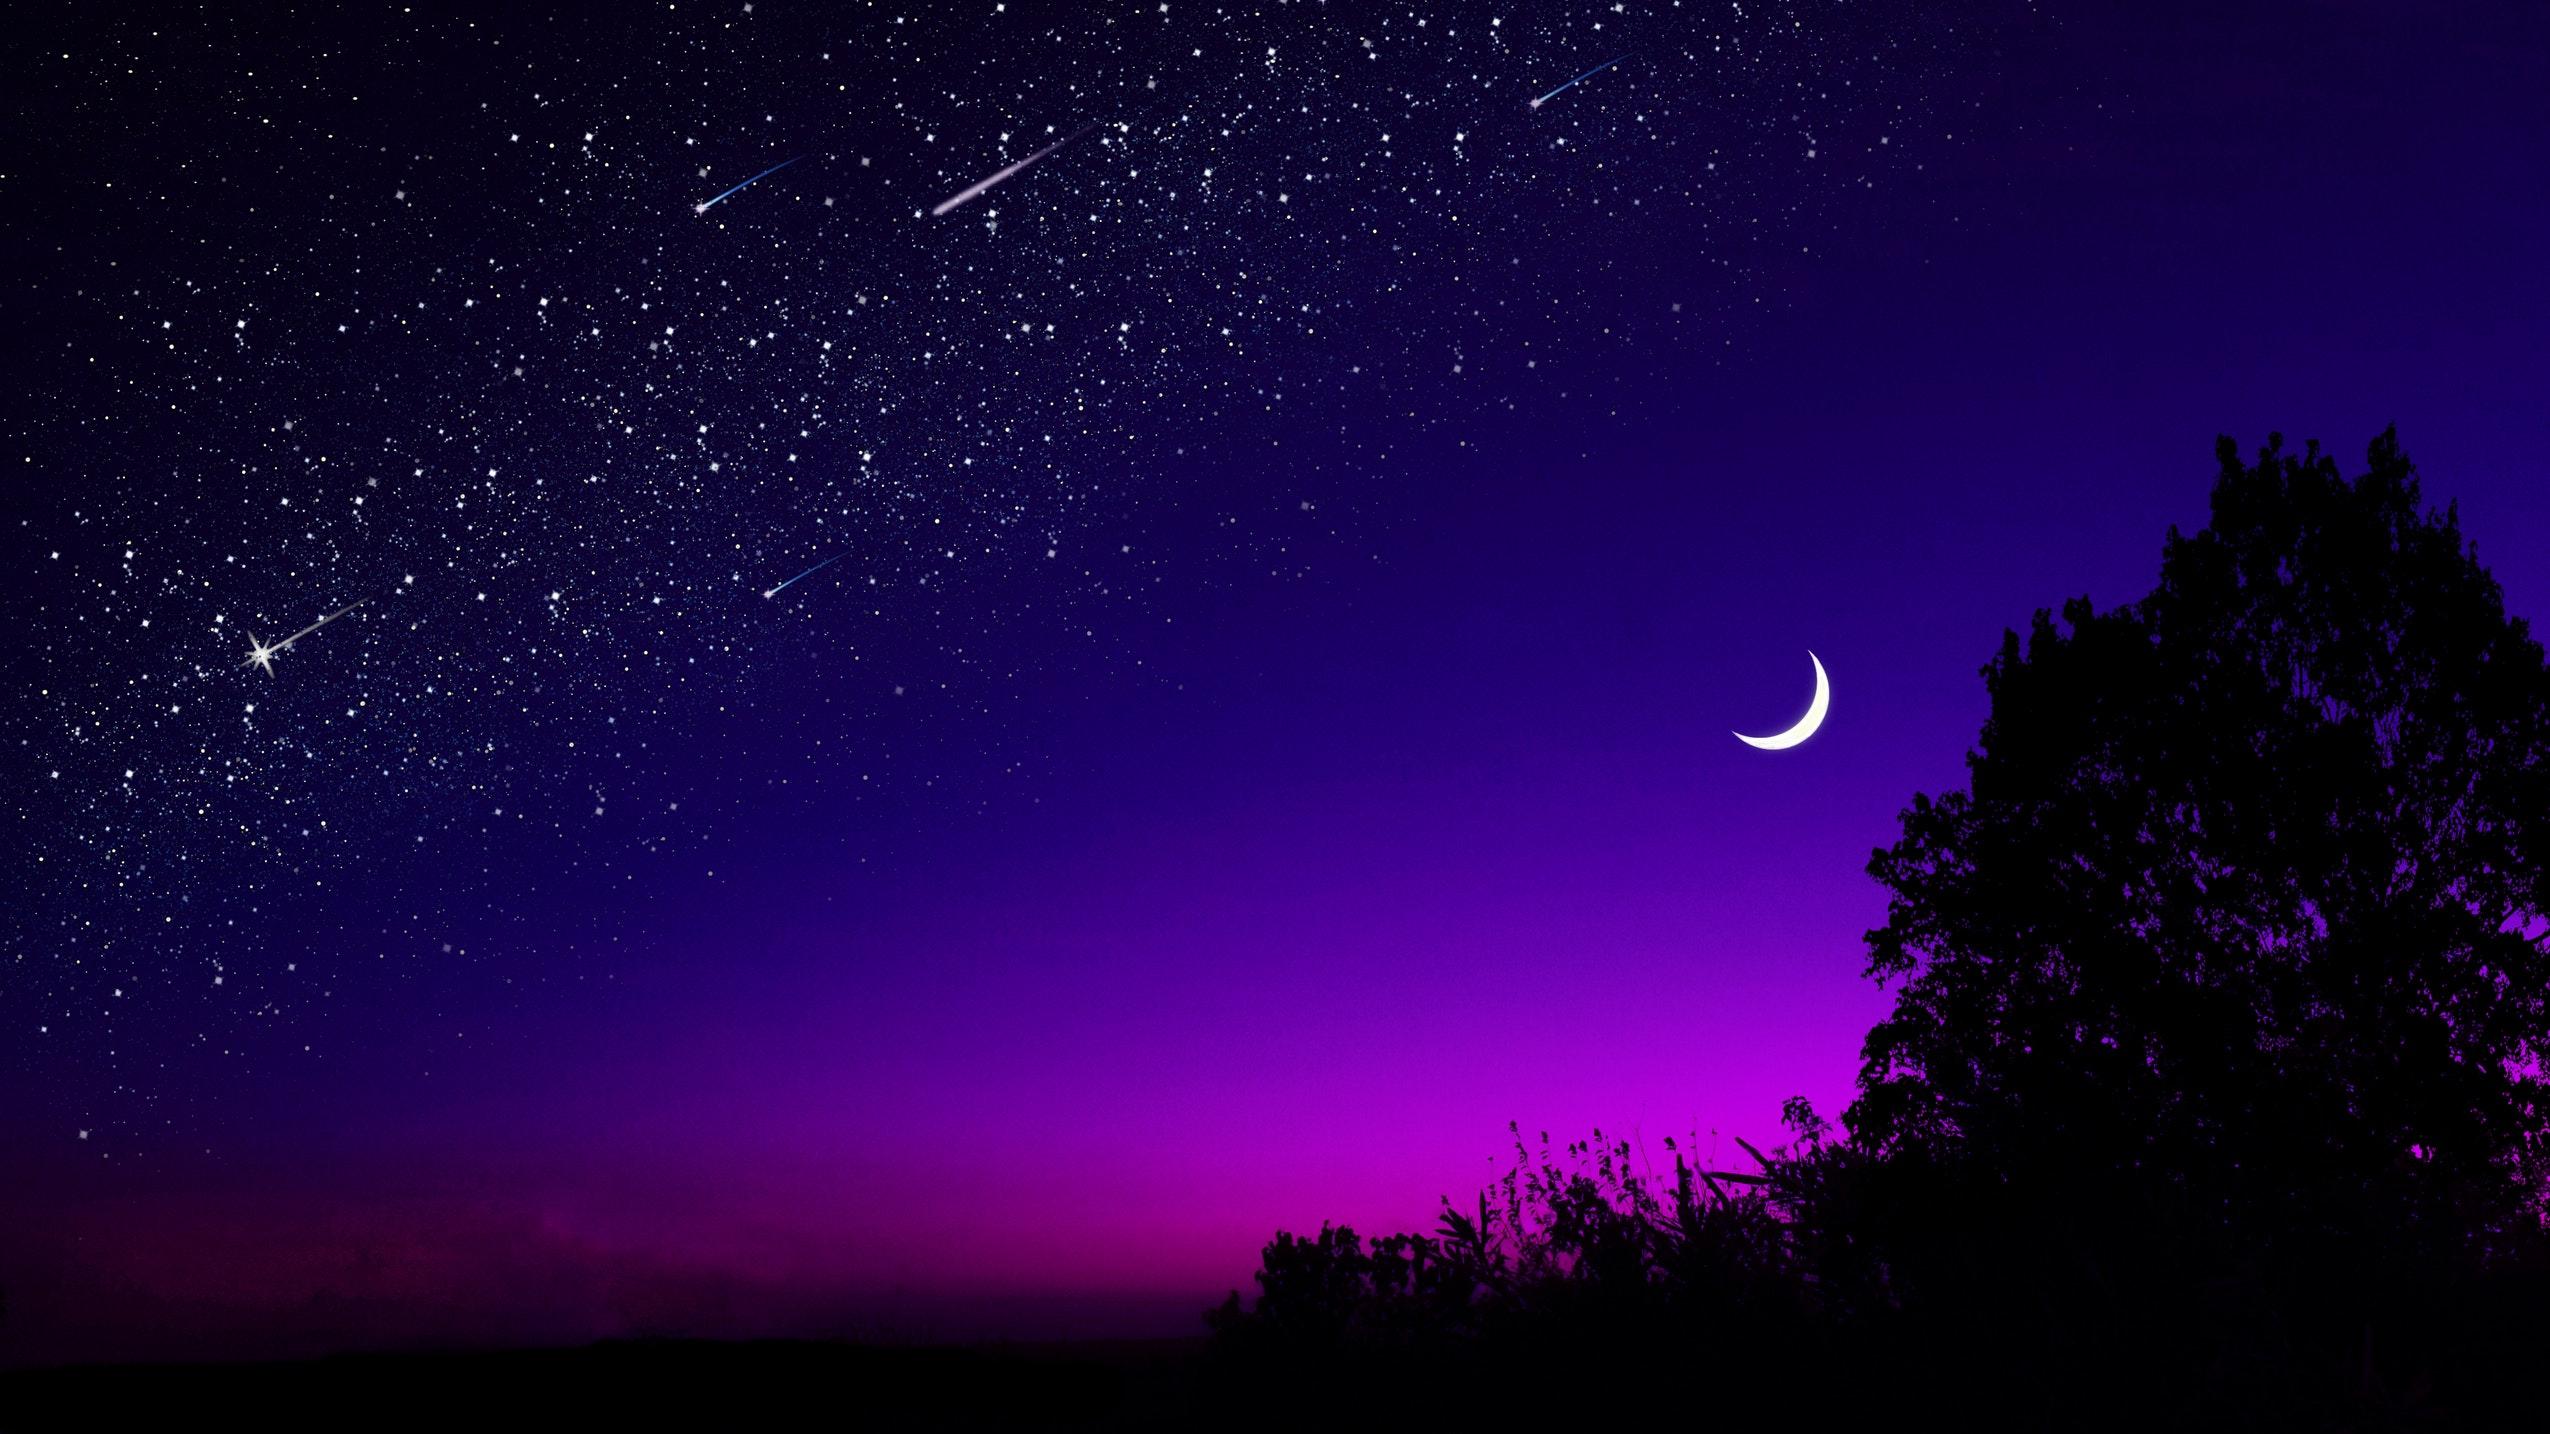 General 2550x1434 dusk sunset dark photography Moon night sky night sky skyscape landscape trees stars comet starry night edit purple evening silhouette crescent moon shooting stars purple sky astronomy meteors